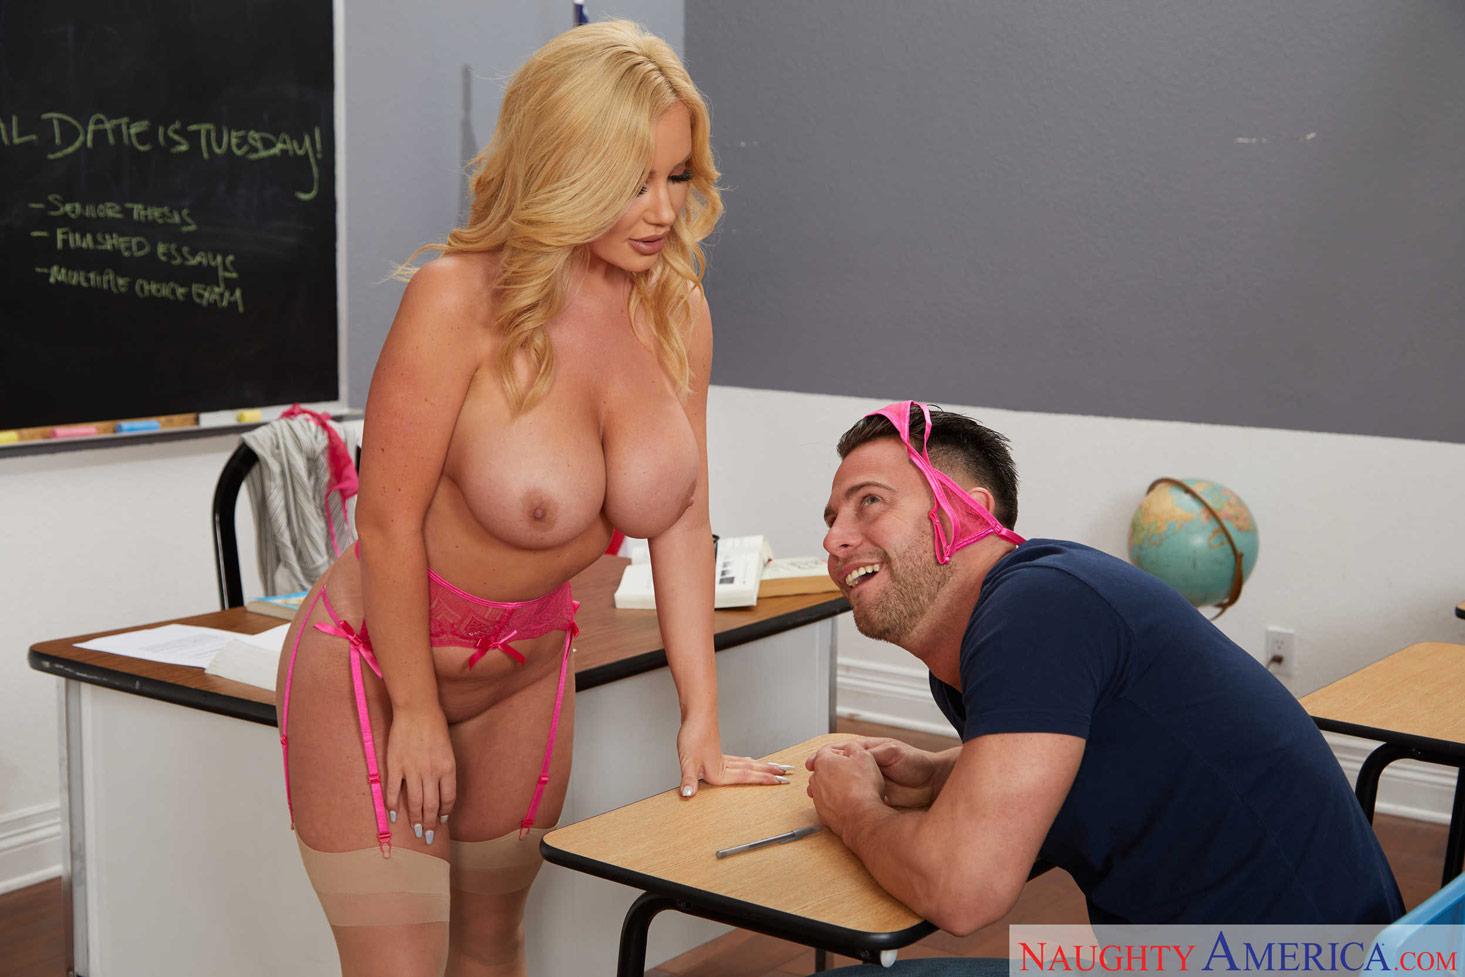 Avannah Porn savannah bond rides her student